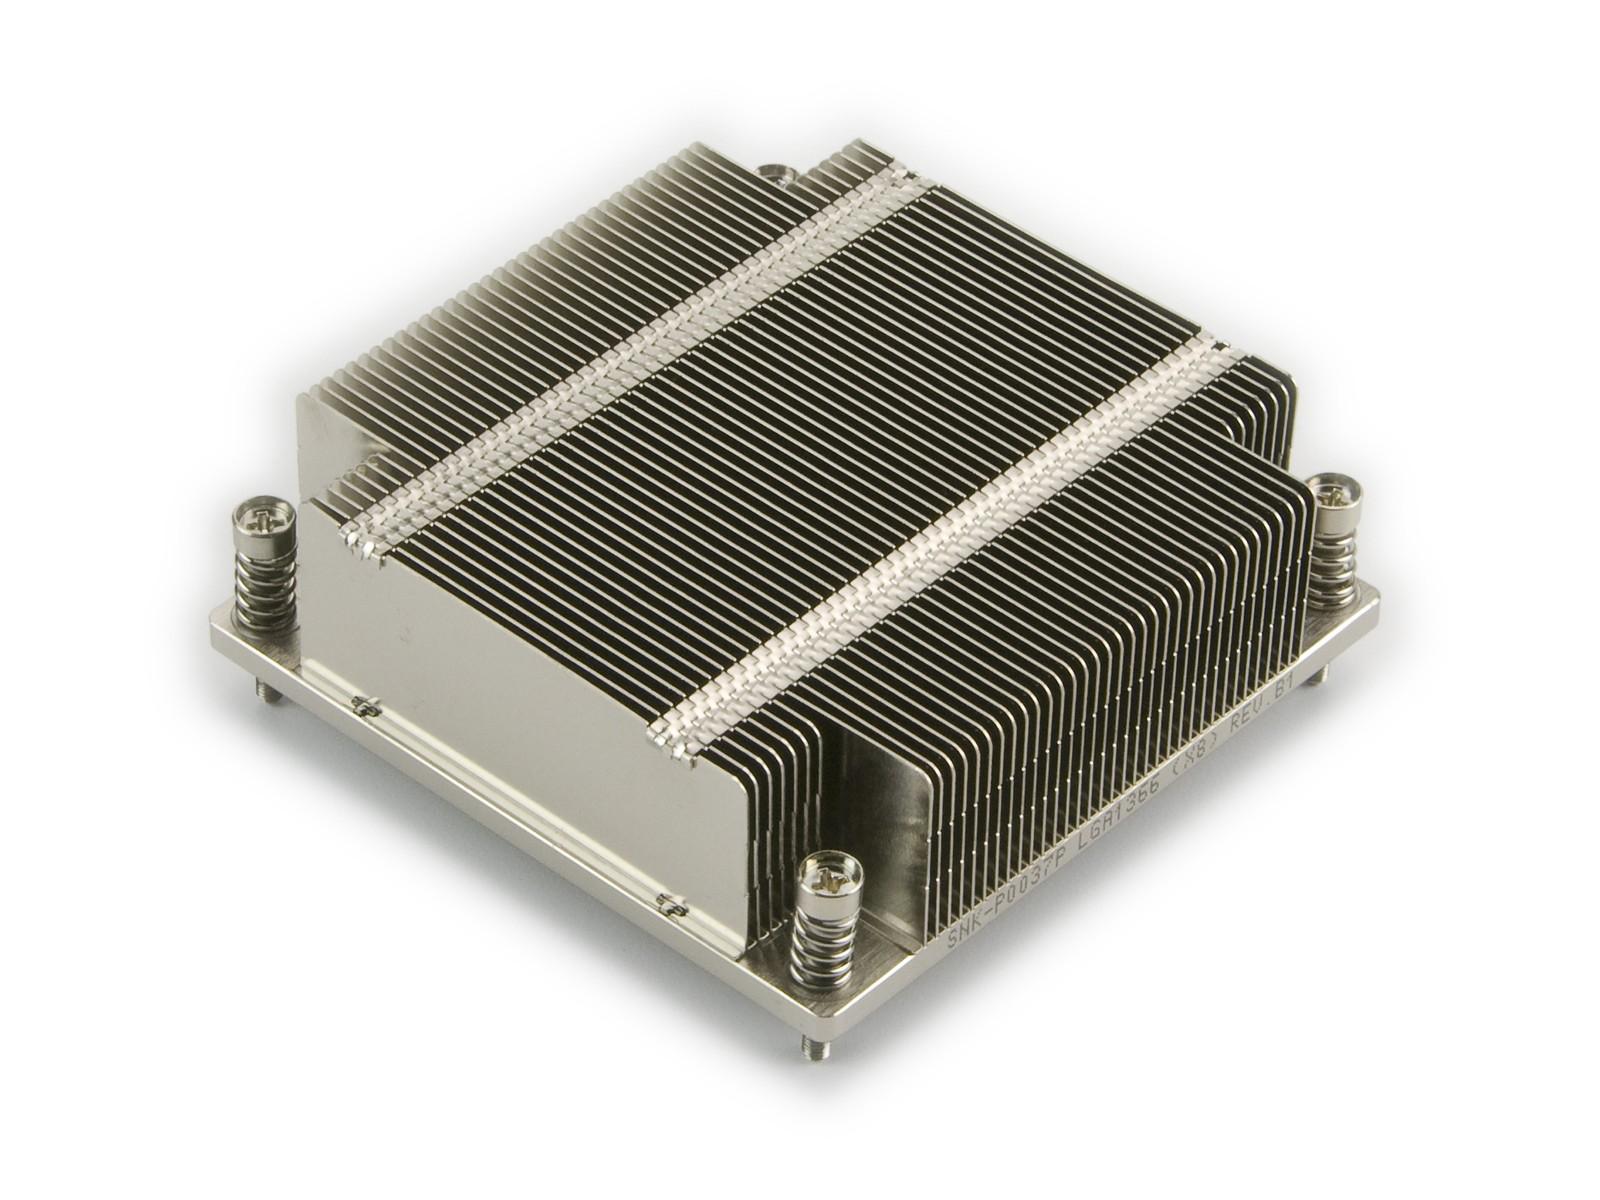 Supermicro 1U LGA1366 (X8) Intel Xeon Socket Heatsink (SNK-P0037P)